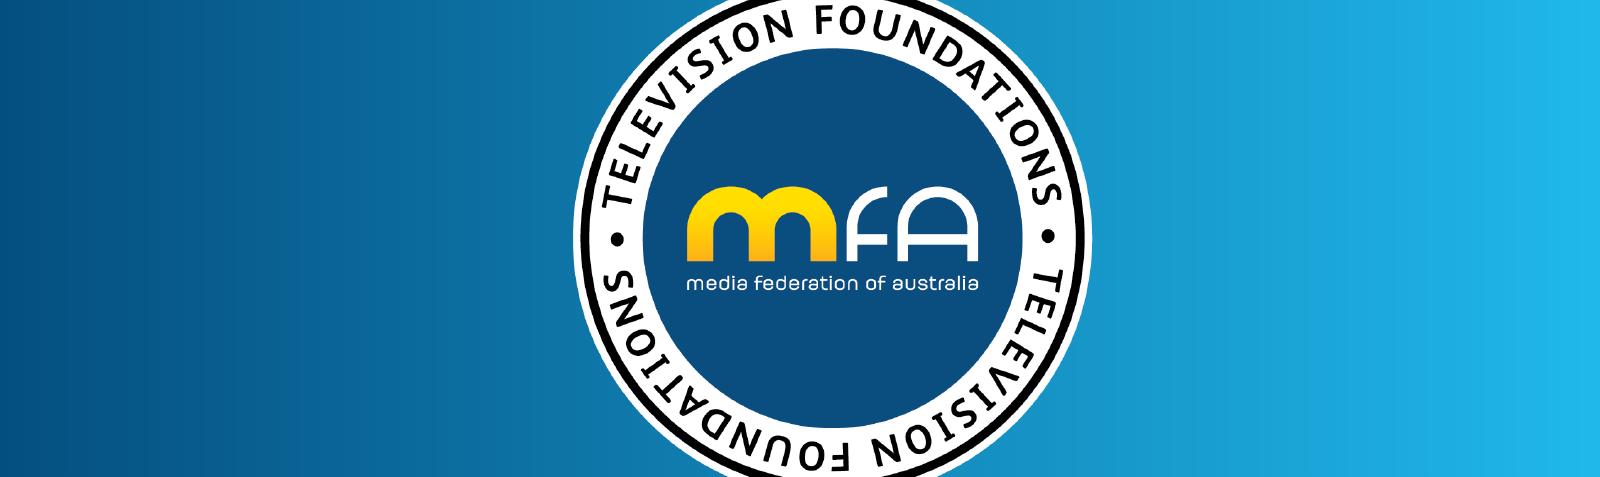 MFATVFoundations_WebsiteBanner-01-01